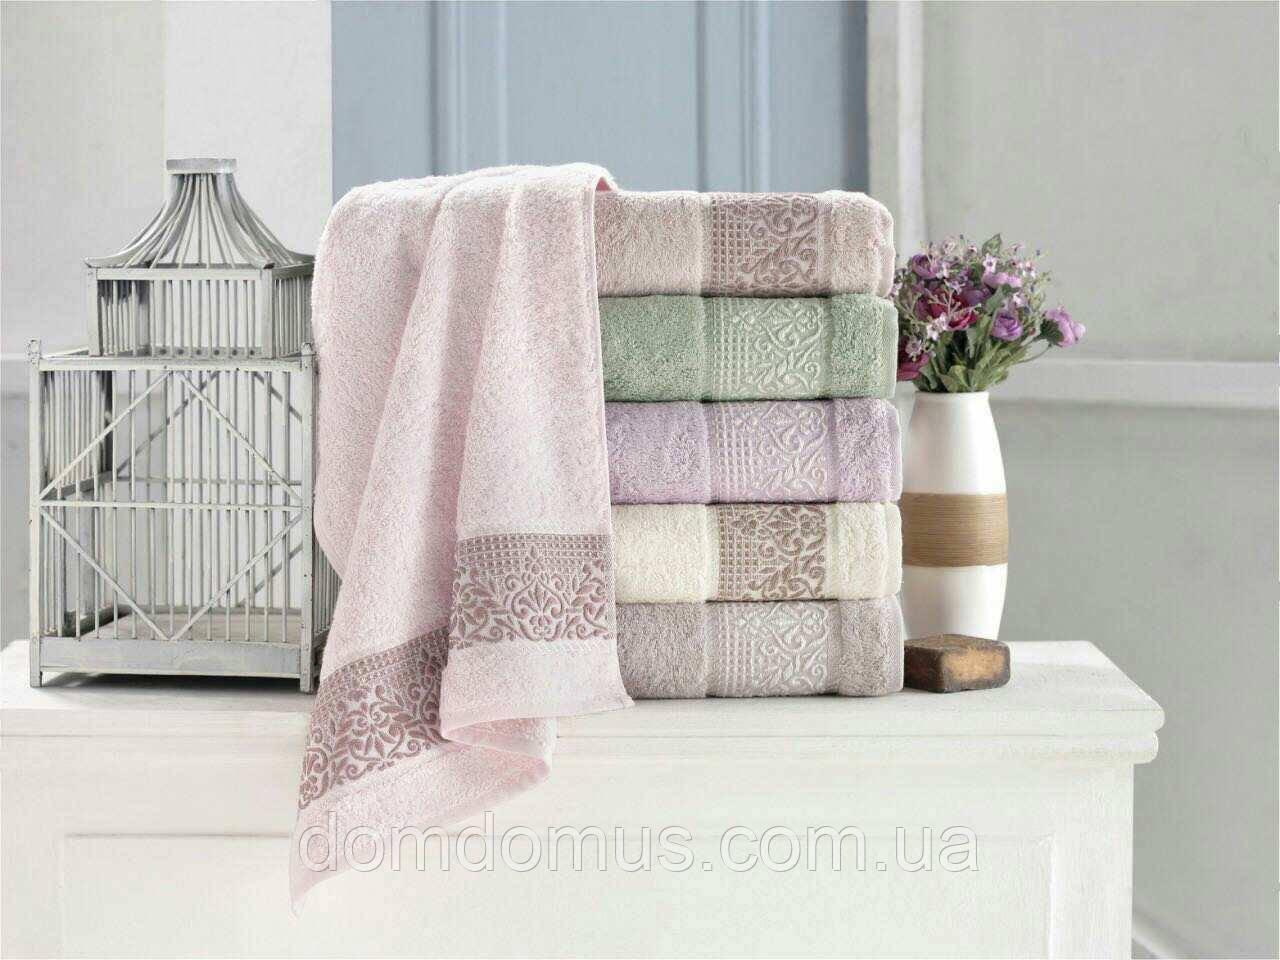 "Махровое полотенце ""Vip Bambo"" 90*150 (100% бамбук), Puppila, Турция 5028"